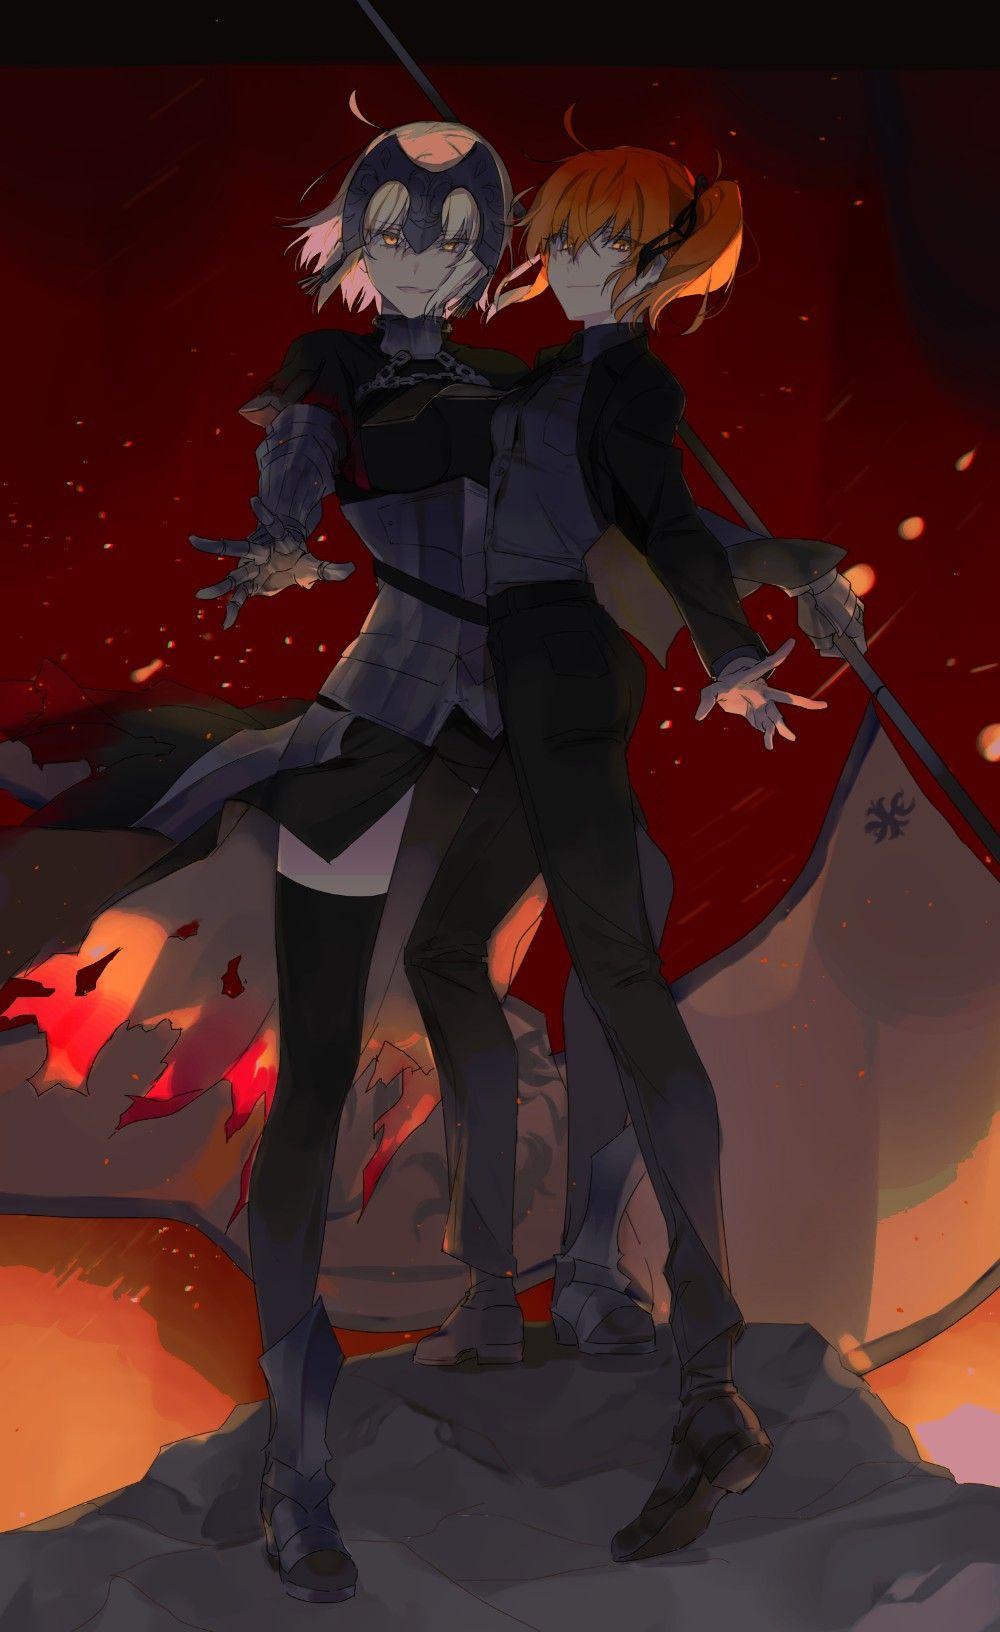 Jalter X Mastah Anime Fate Anime Series Fate